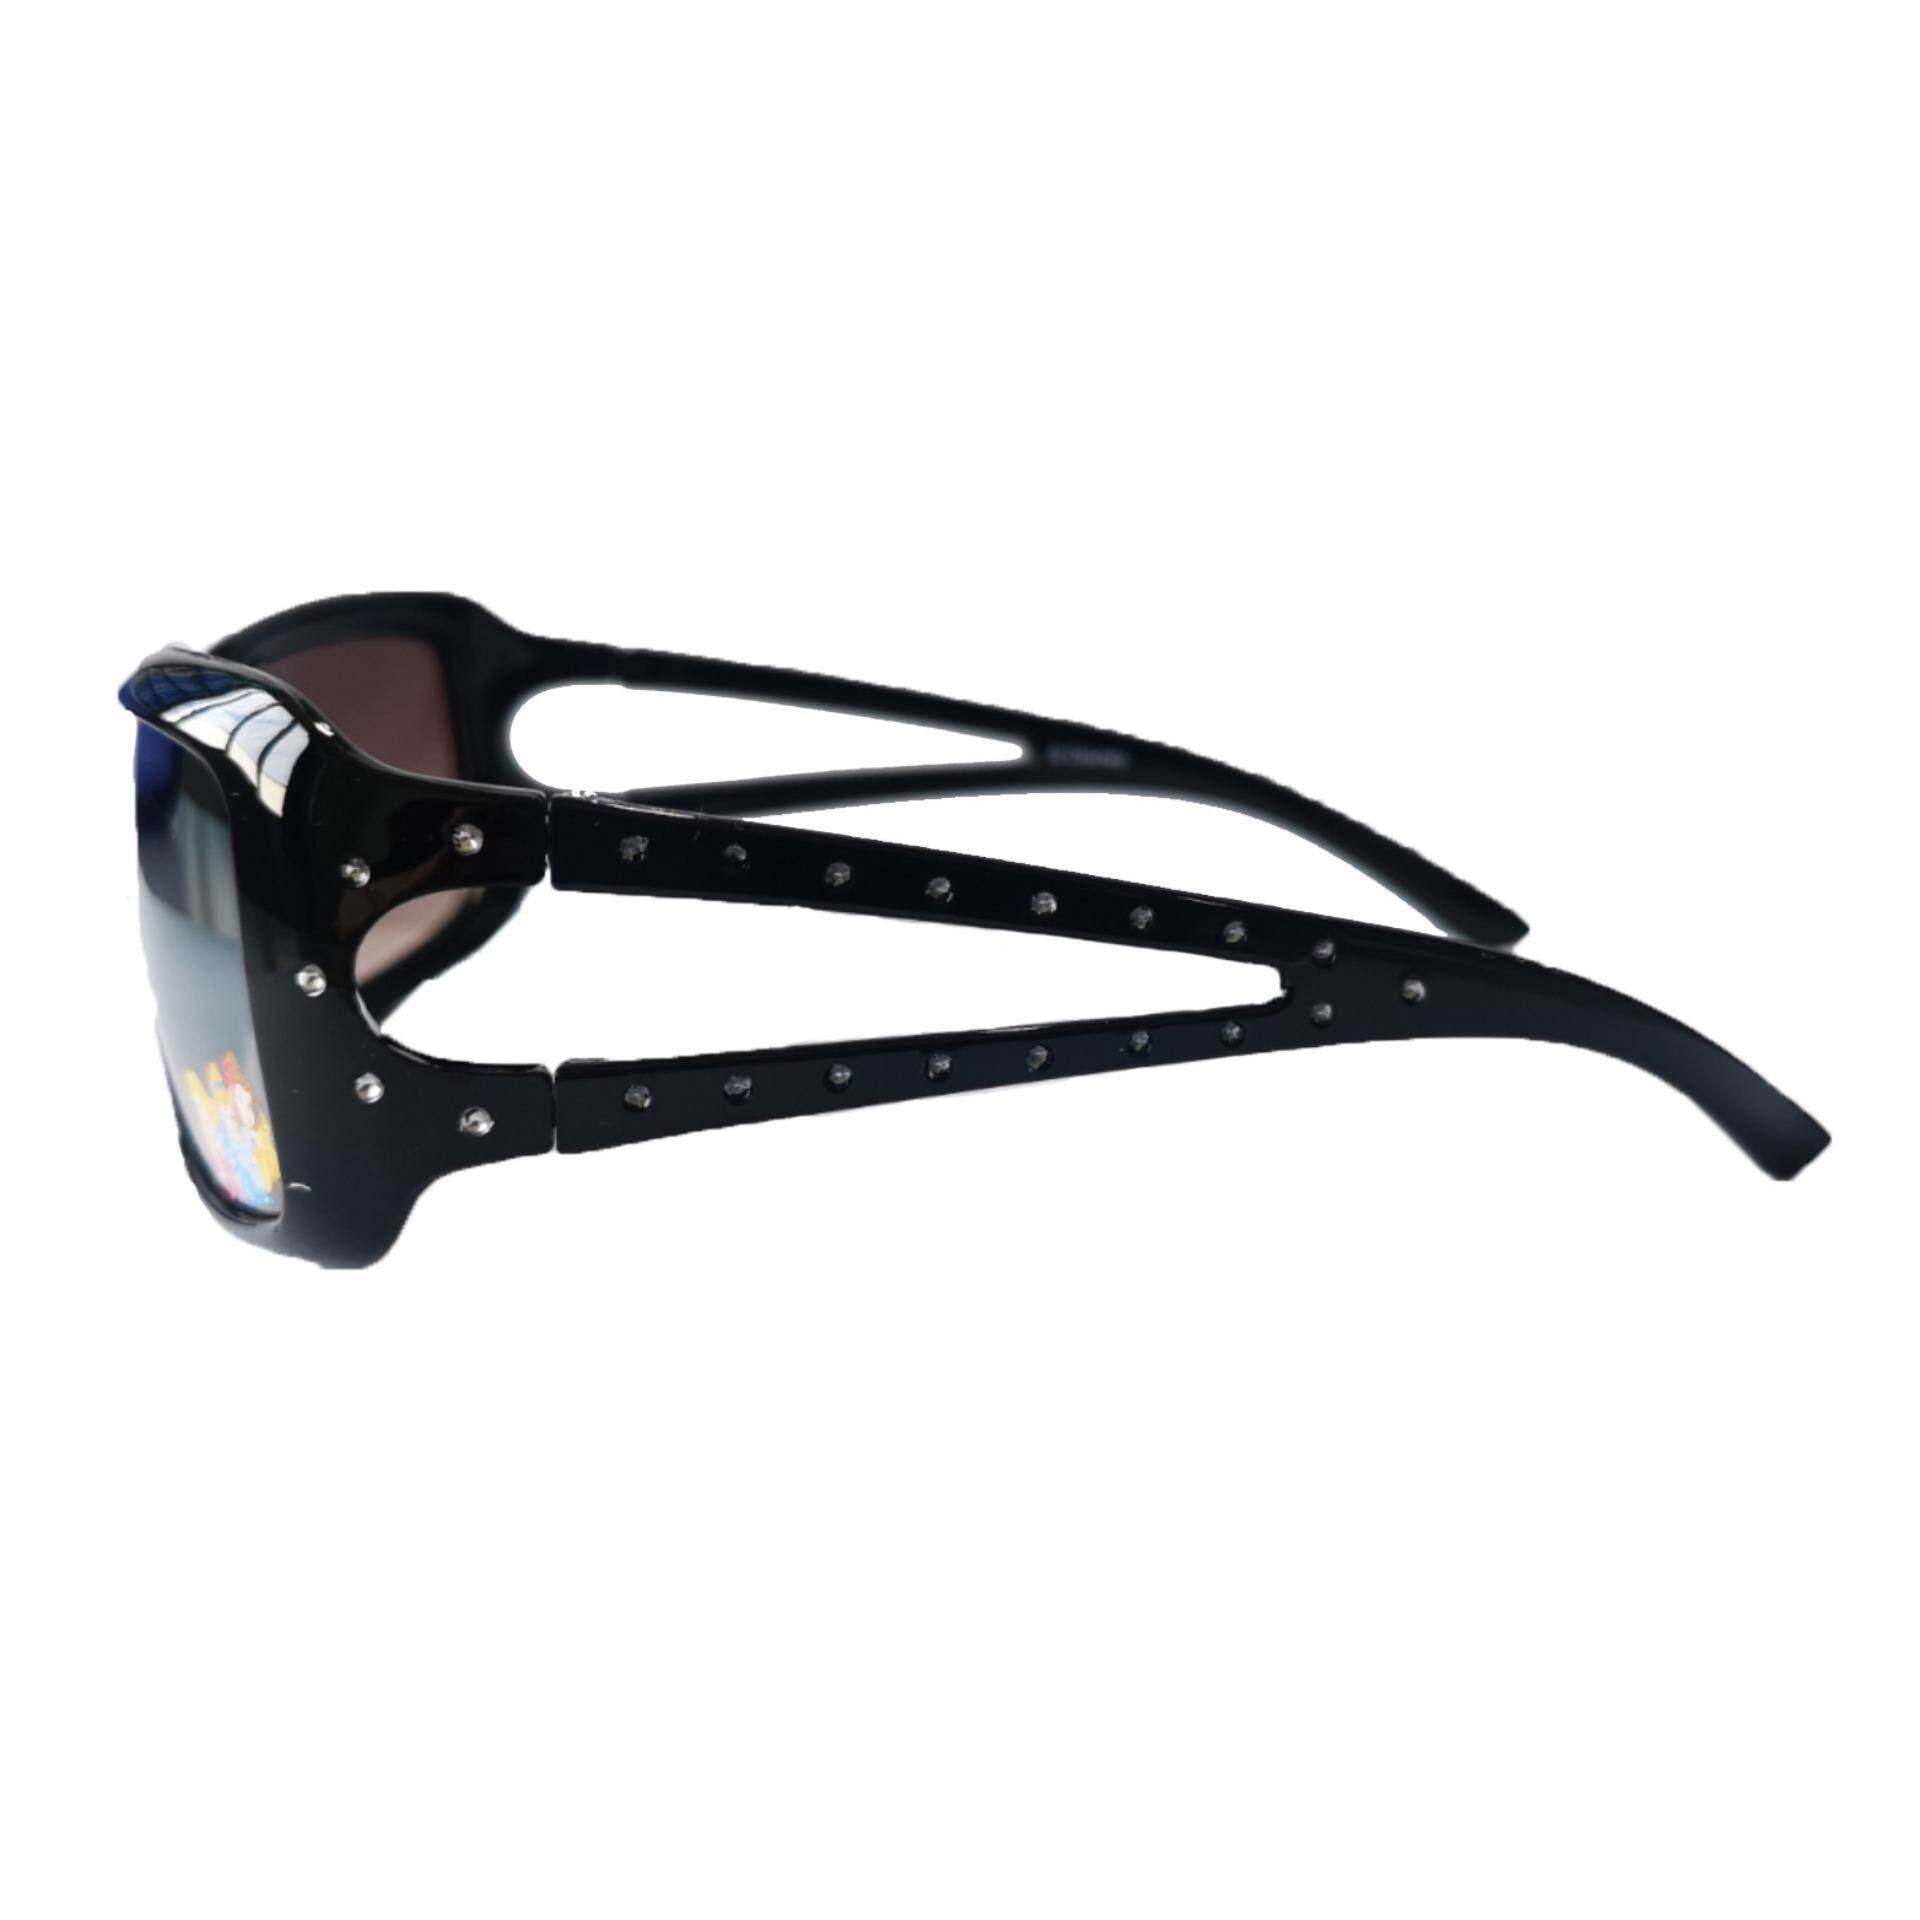 68c50bd3bb Disney Princess Girls Square Lens 100% UV Protection Eyewear Outdoor  Sunglasses - Black Colour